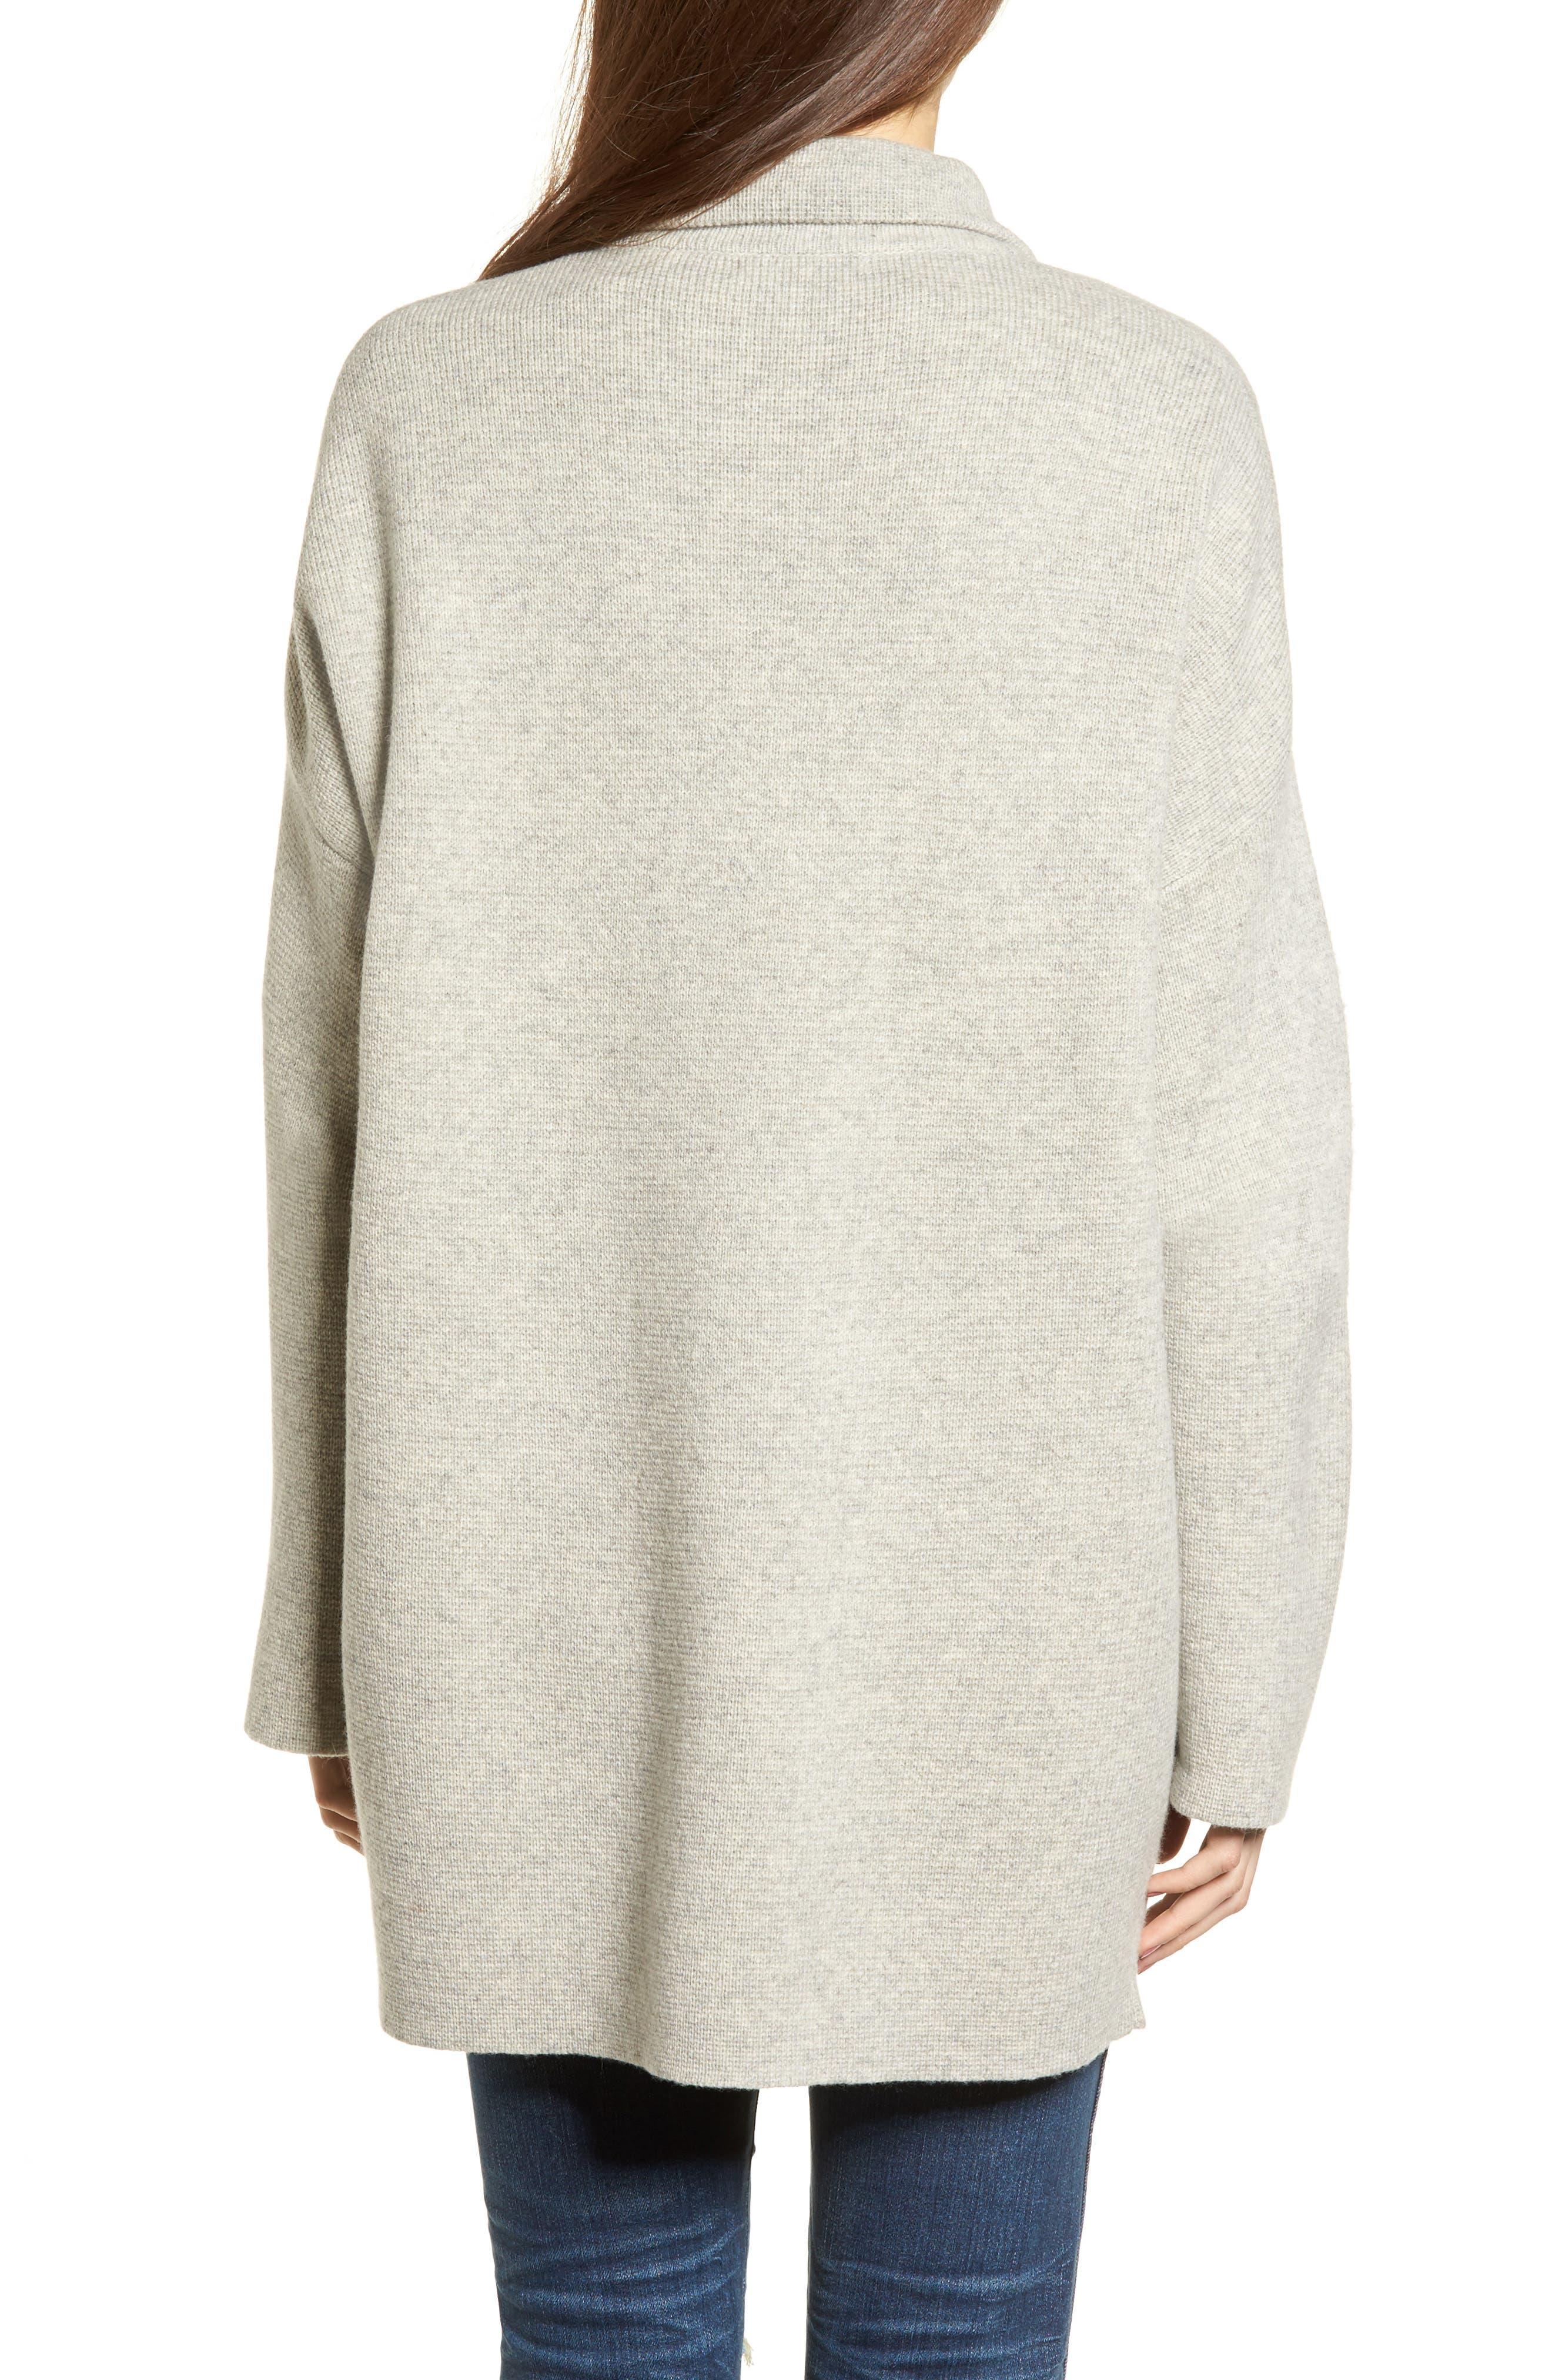 Blazer Sweater Jacket,                             Alternate thumbnail 2, color,                             020